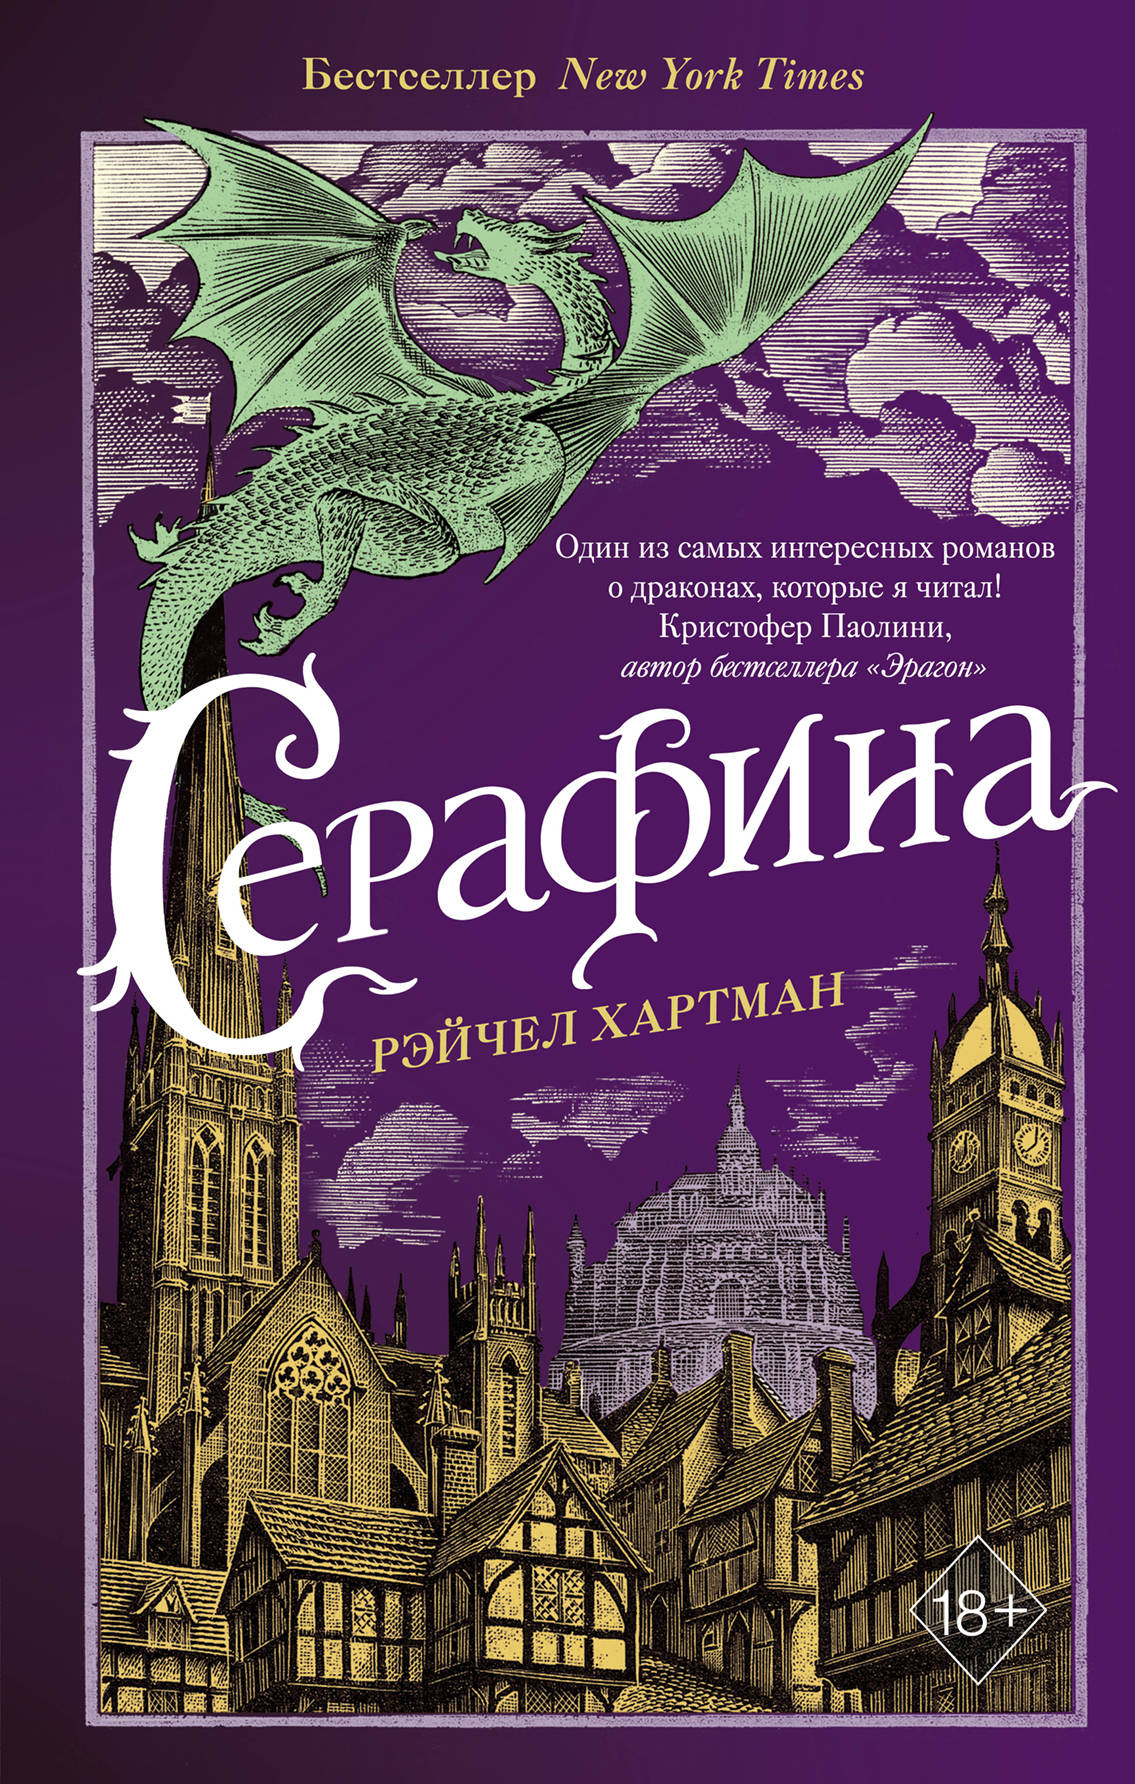 Serafina (#1)